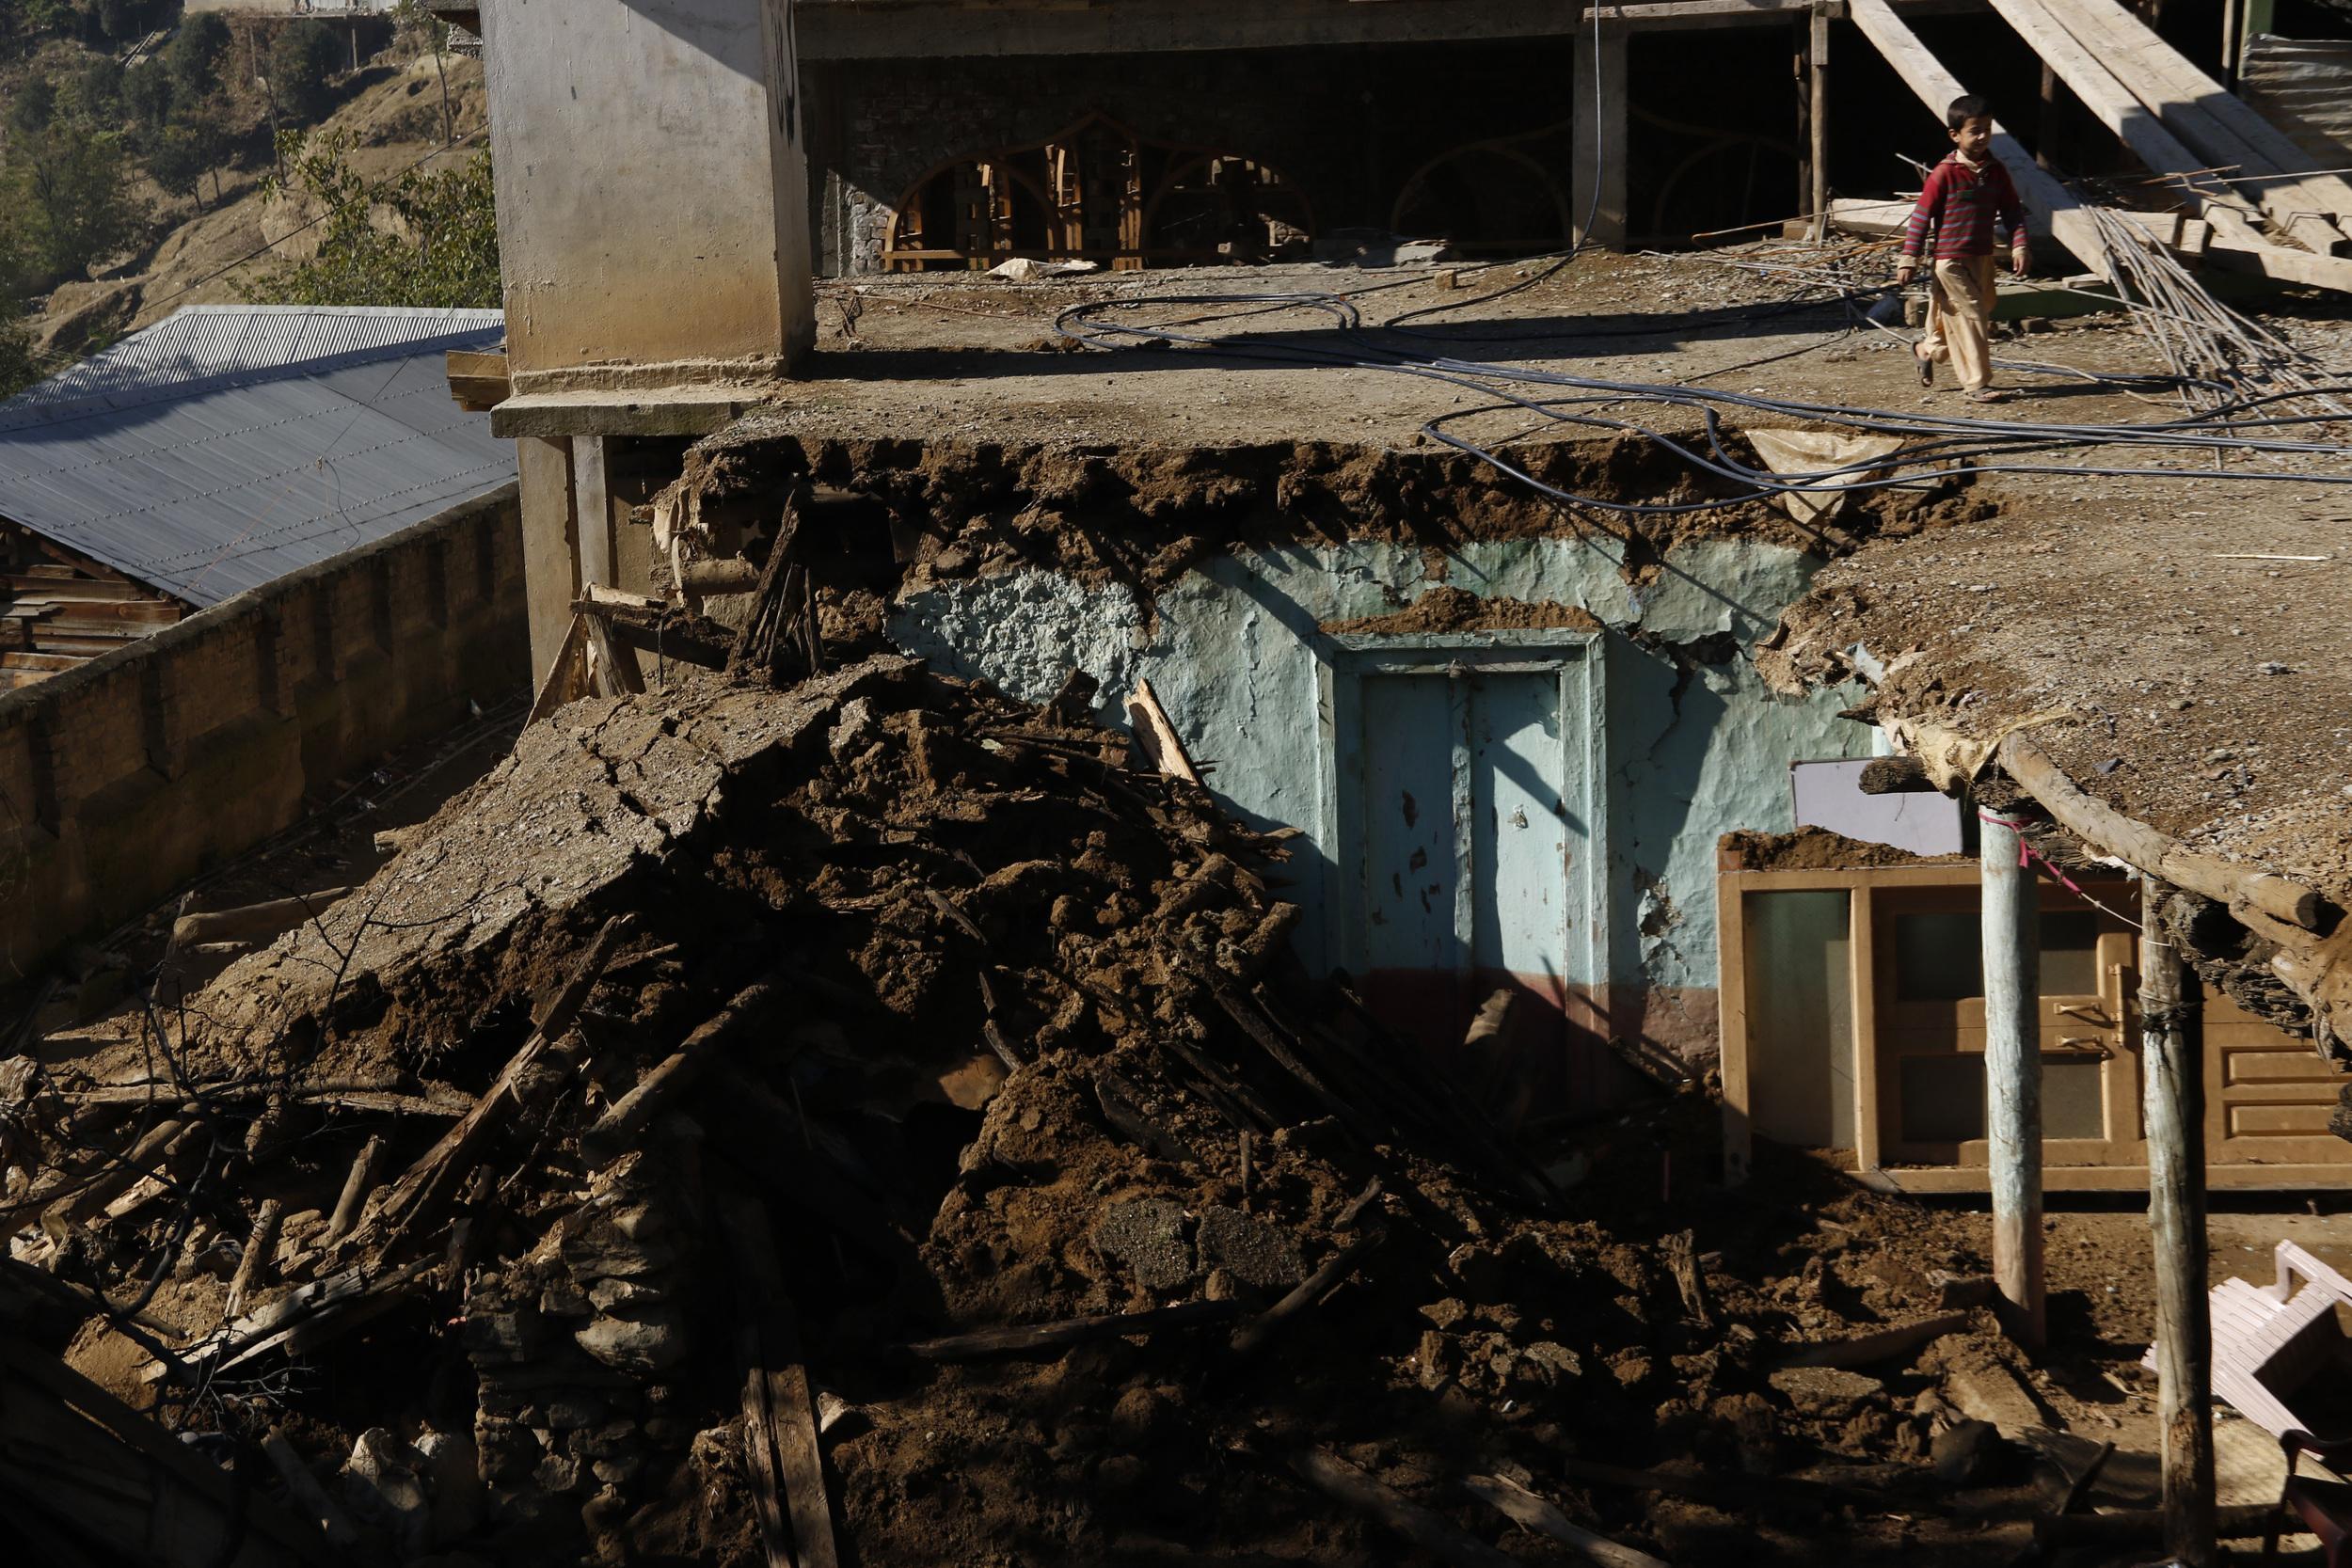 KPK Pak Earthquake Damage 3.jpg